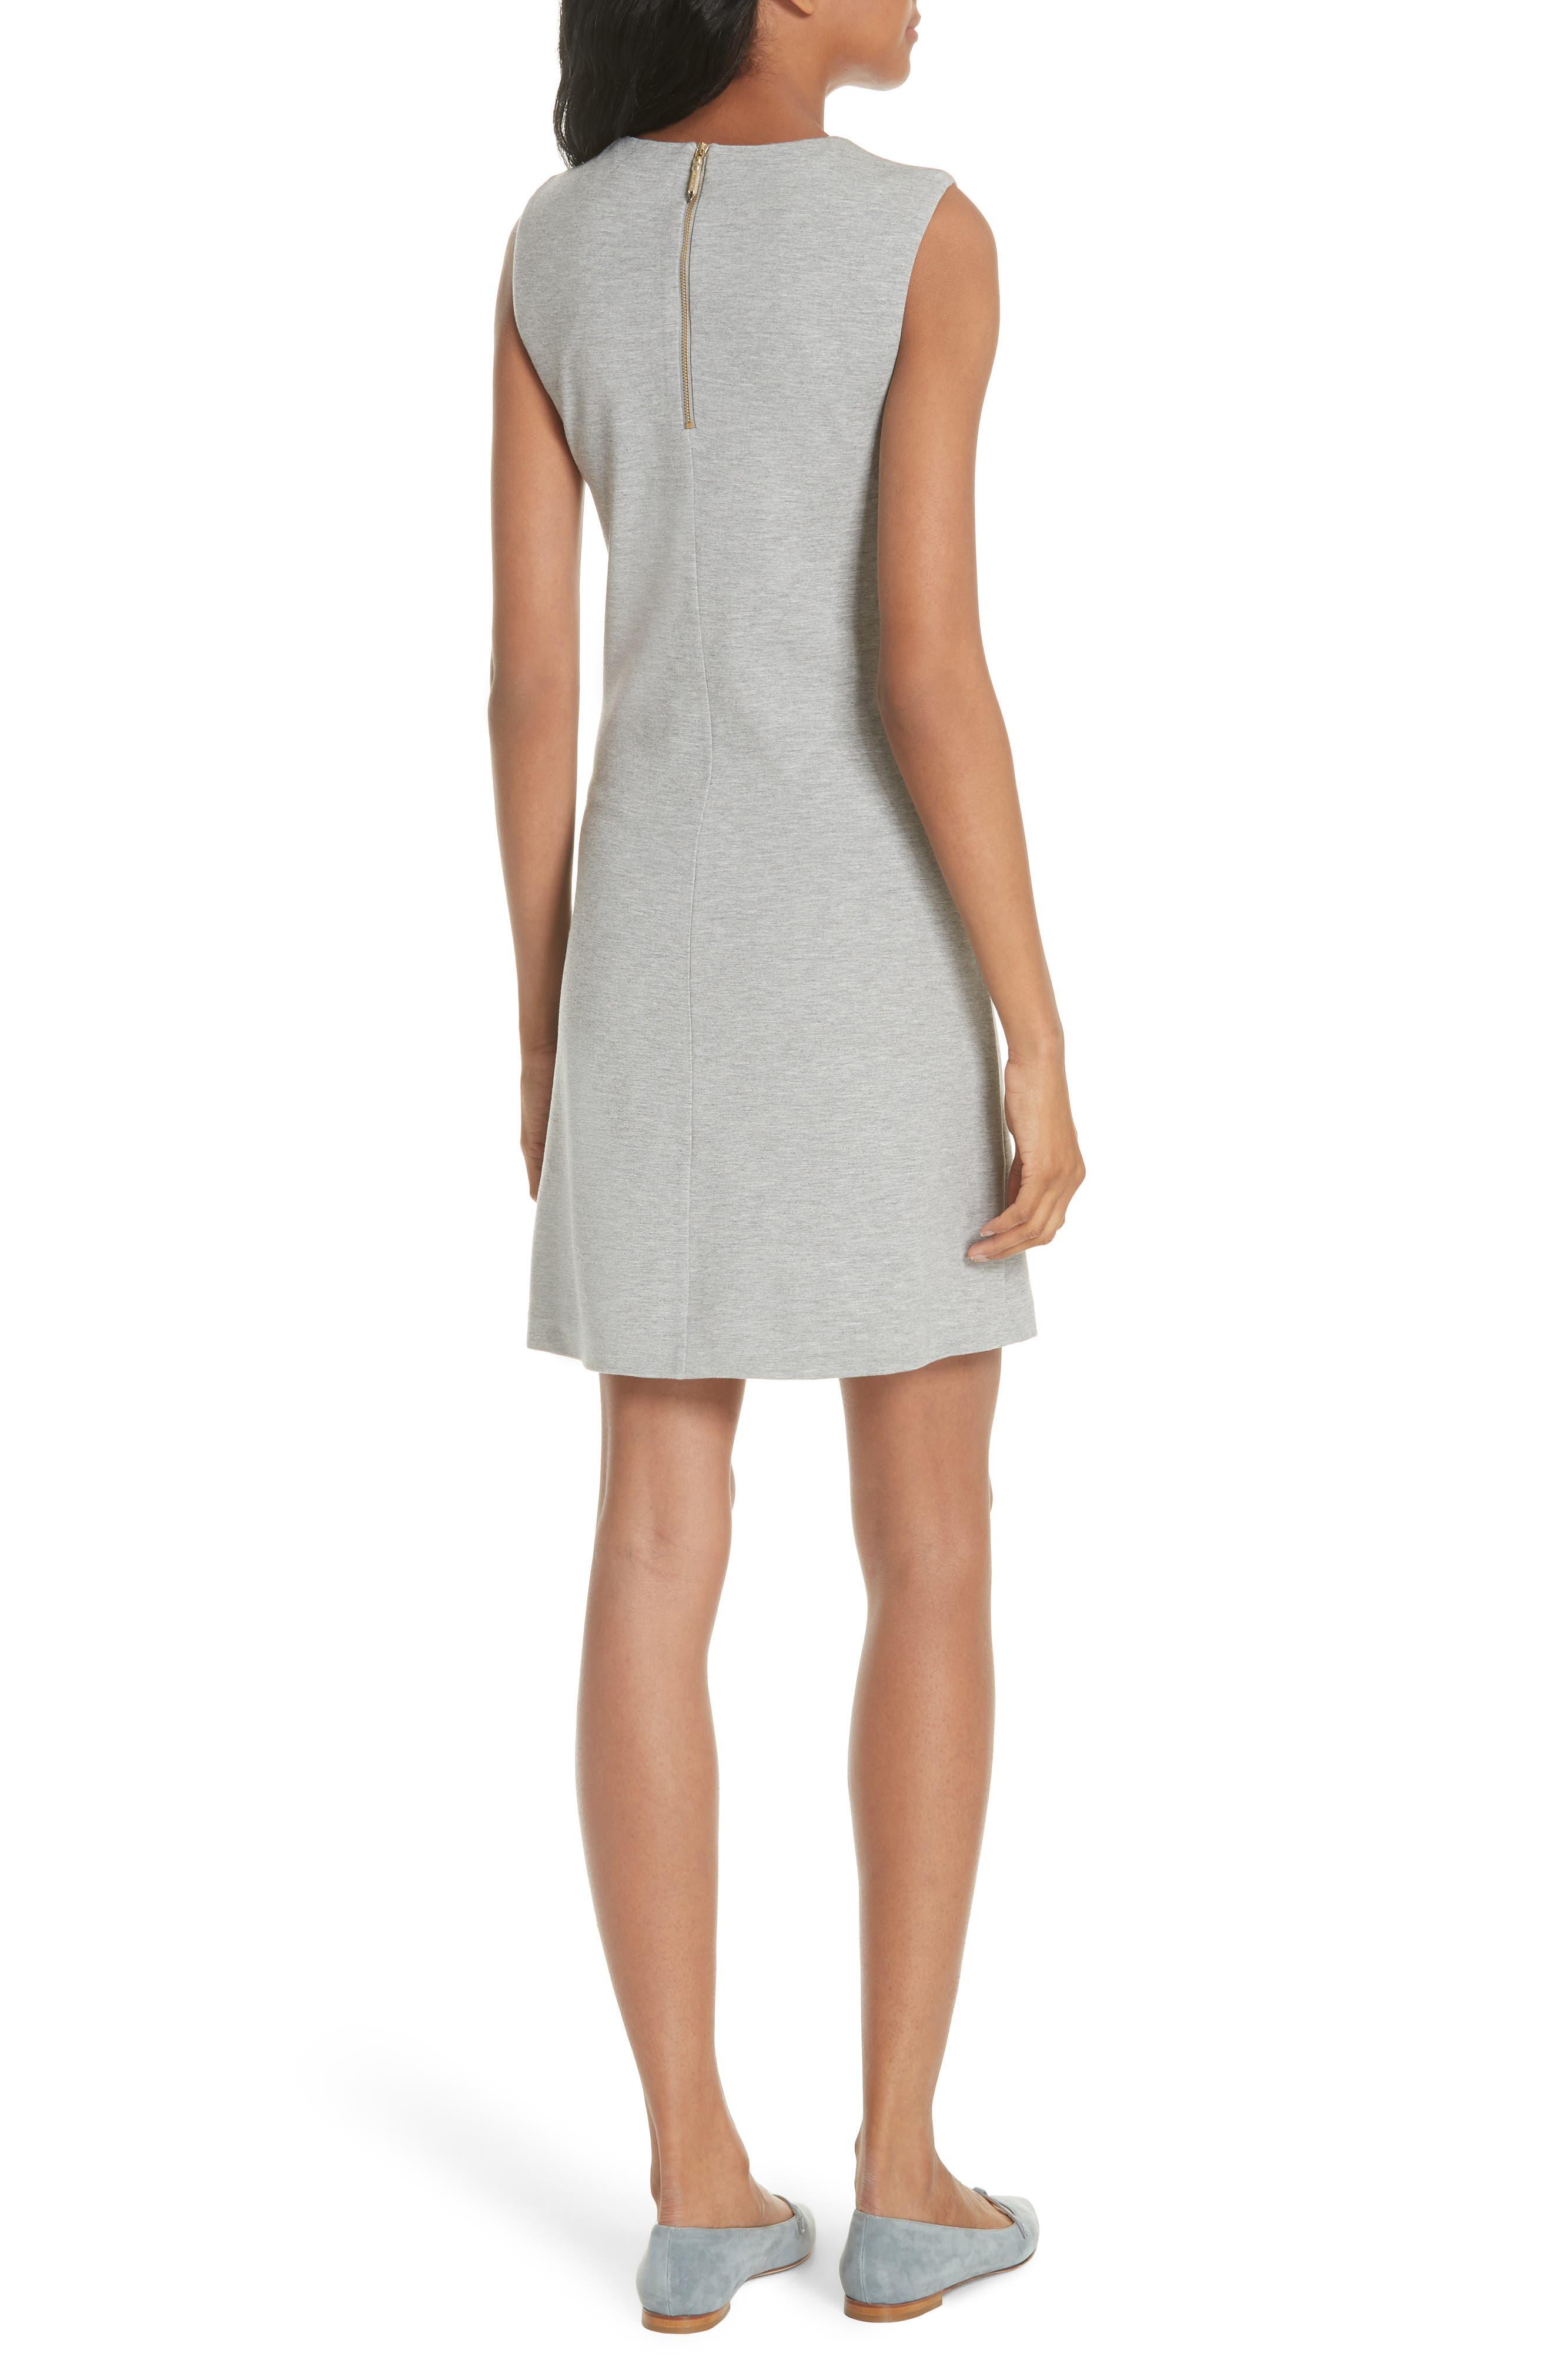 Evalina Tie Front Dress,                             Alternate thumbnail 2, color,                             Grey Marl